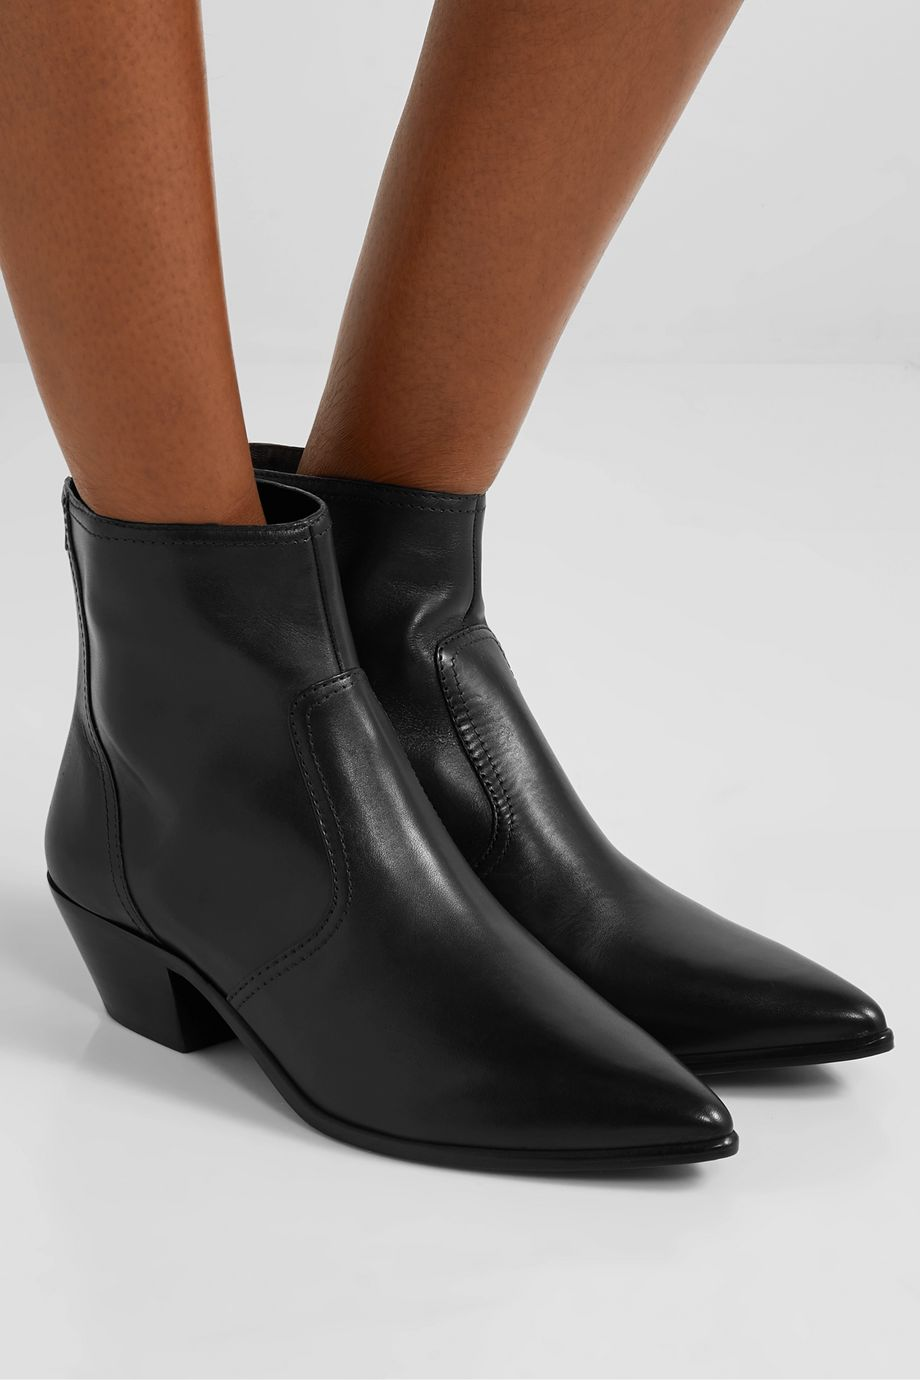 Loeffler Randall Joni leather ankle boots